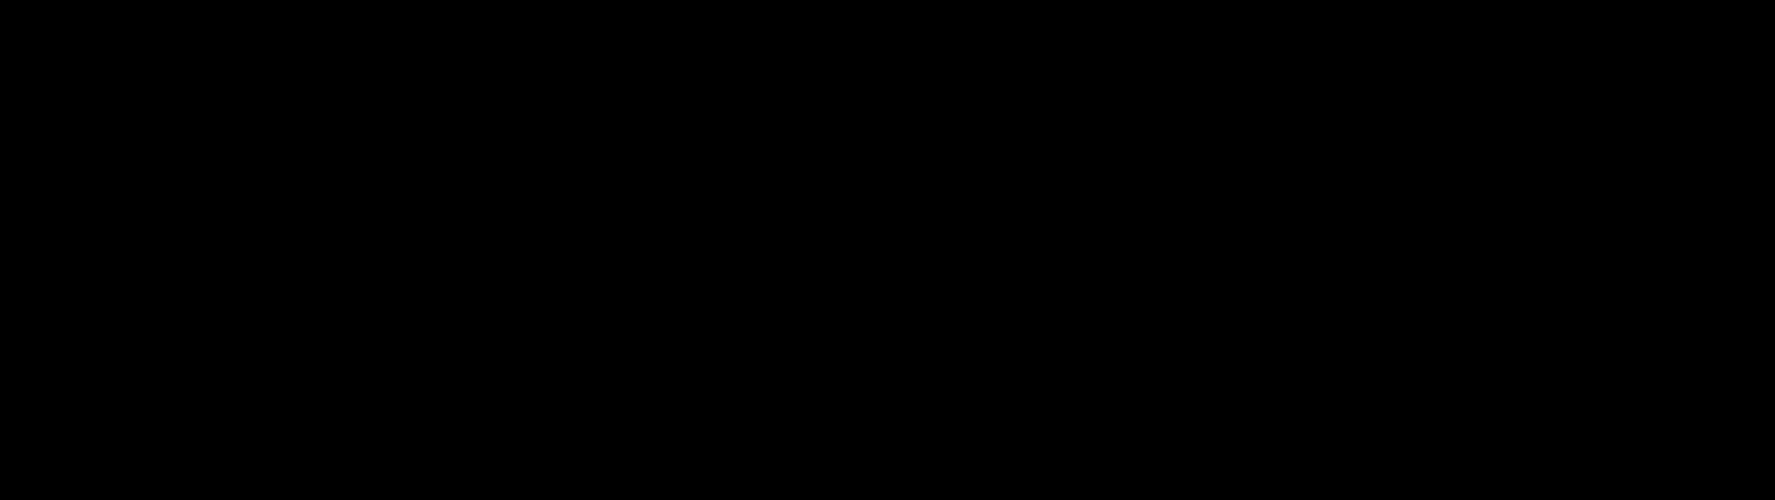 2015-logo-black.png